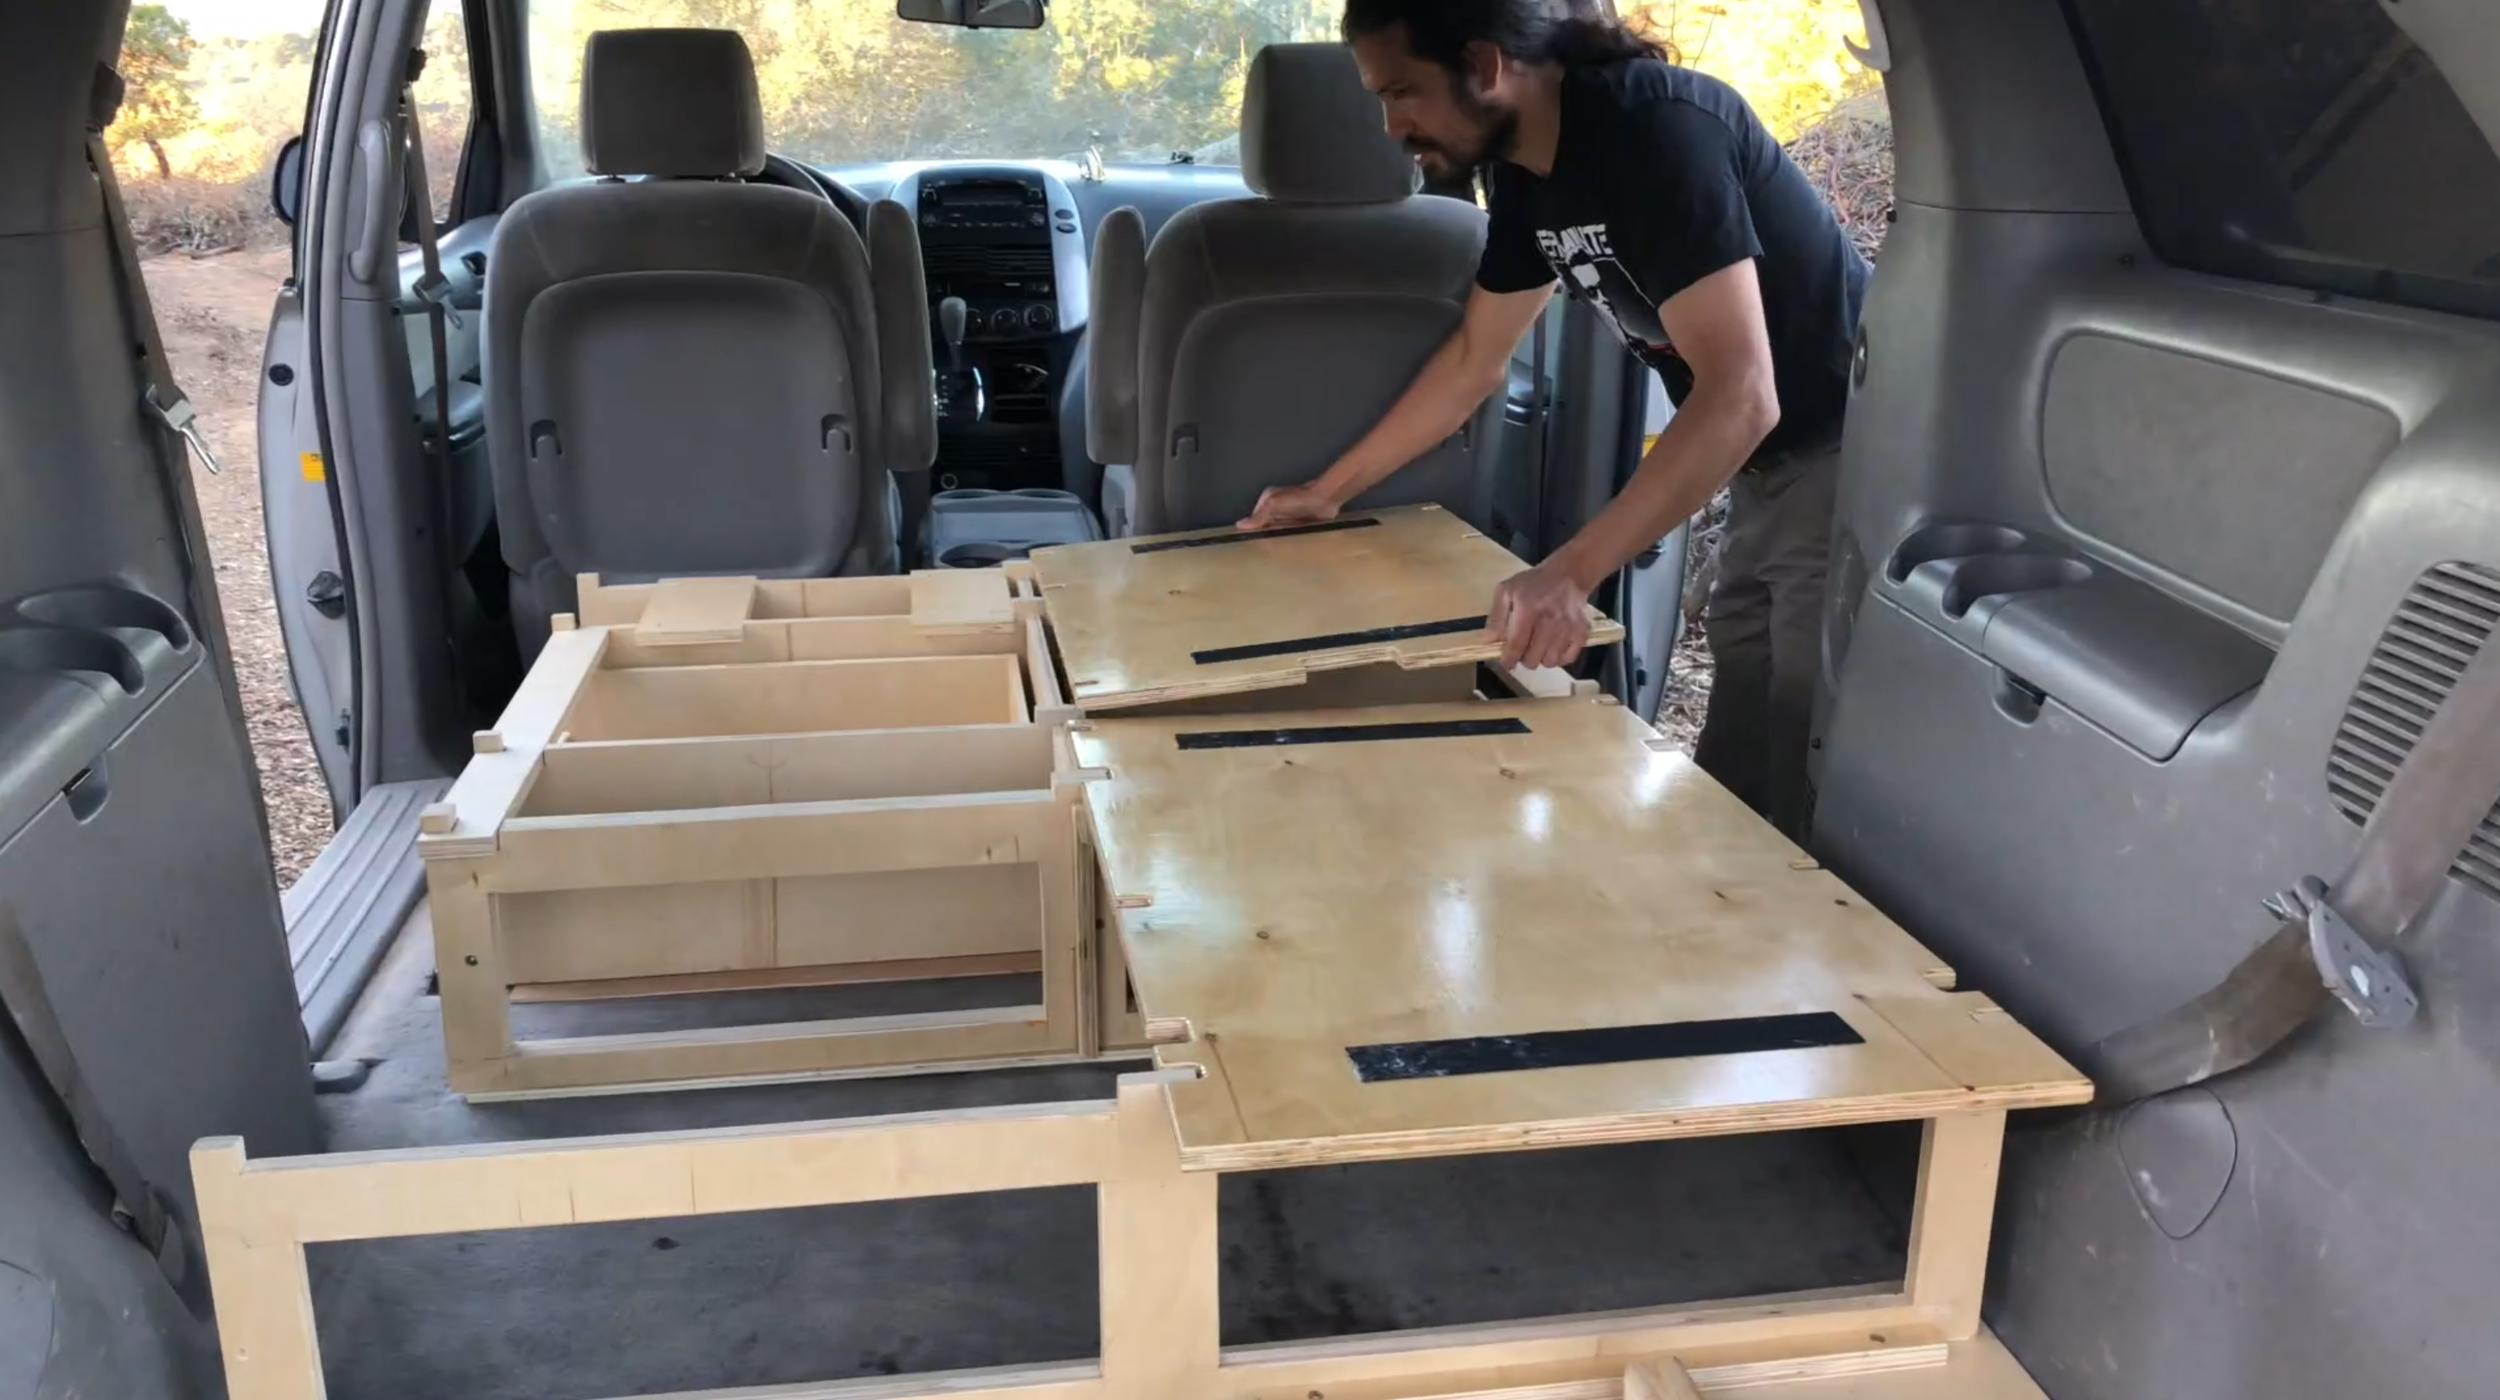 bob placing bed panels.png